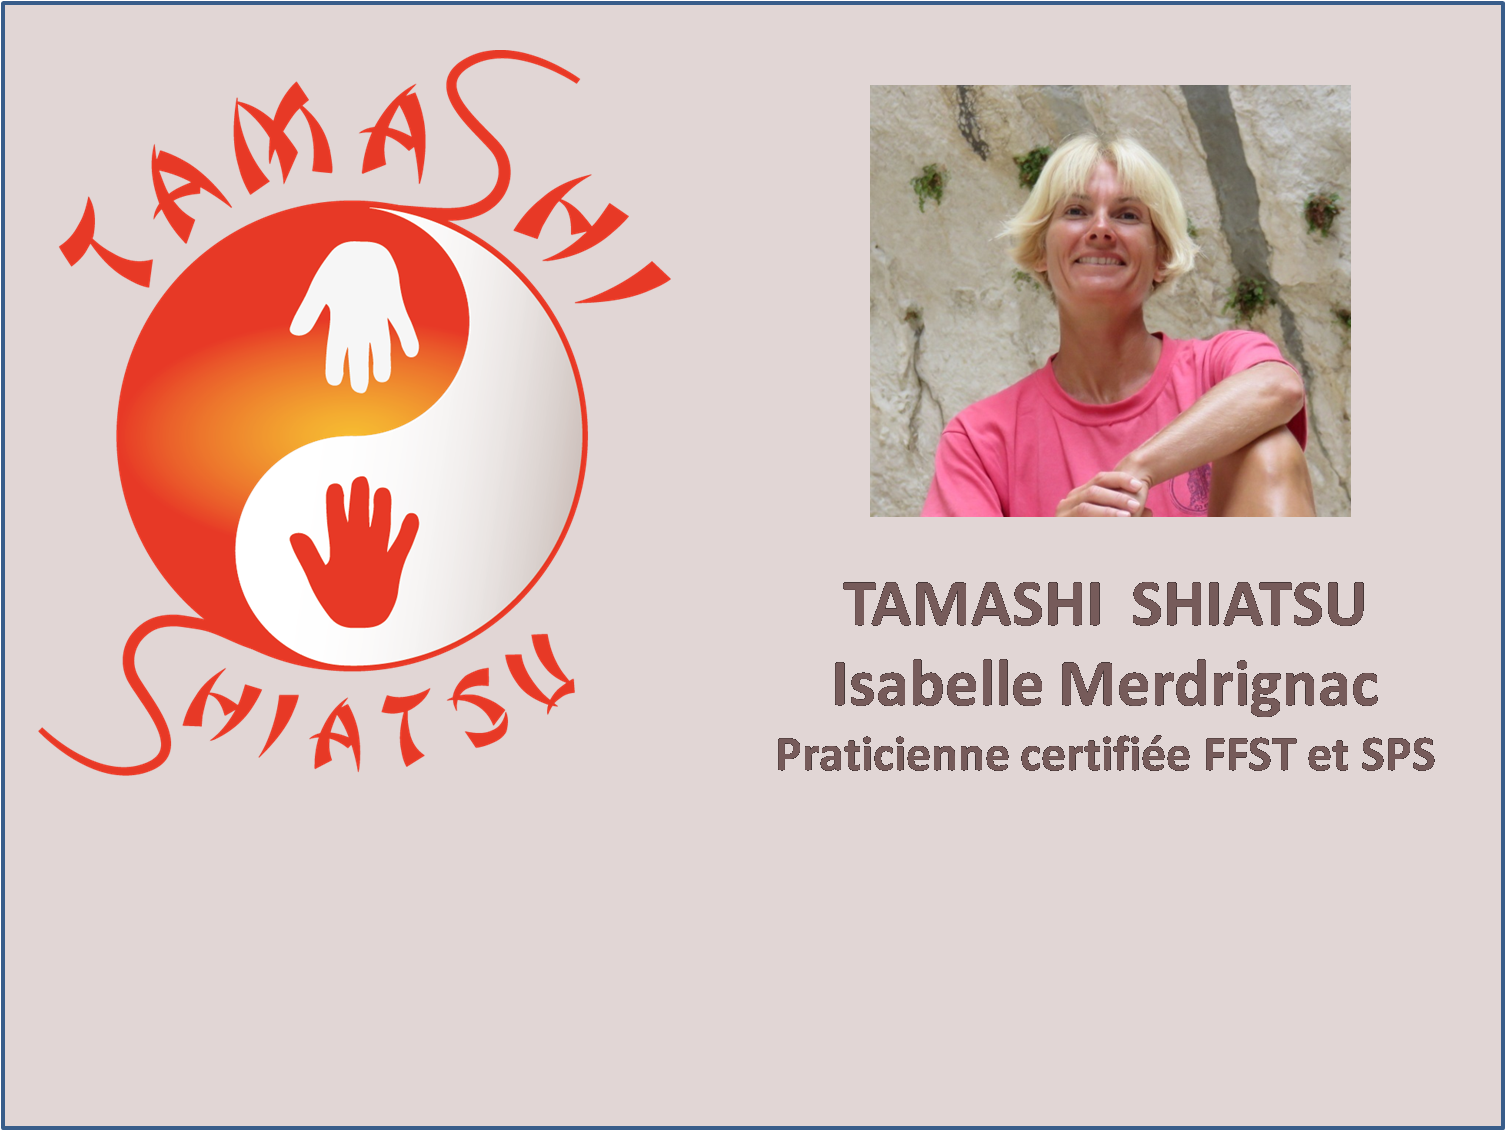 Isabelle Merdrignac - Tamashi Shiatsu 69